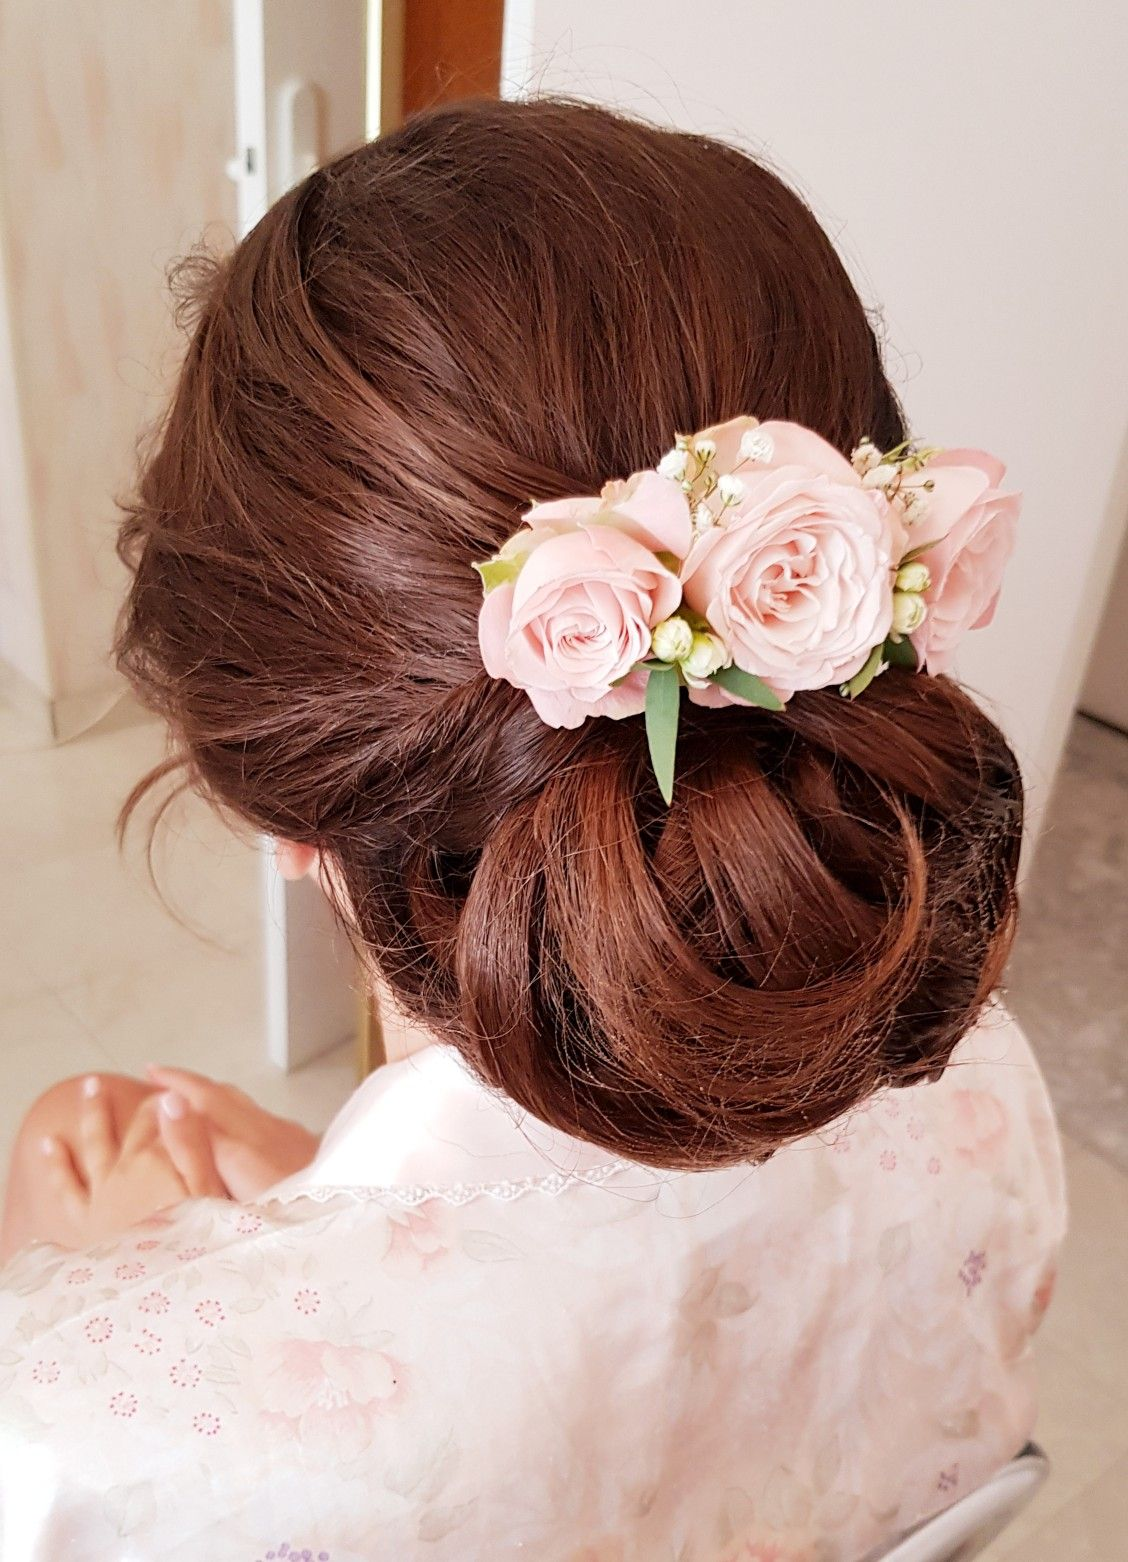 #chignons #hairupdo #weddingstyle #weddingwire #weddingguest #weddinginspo #mariee #mariée # ...